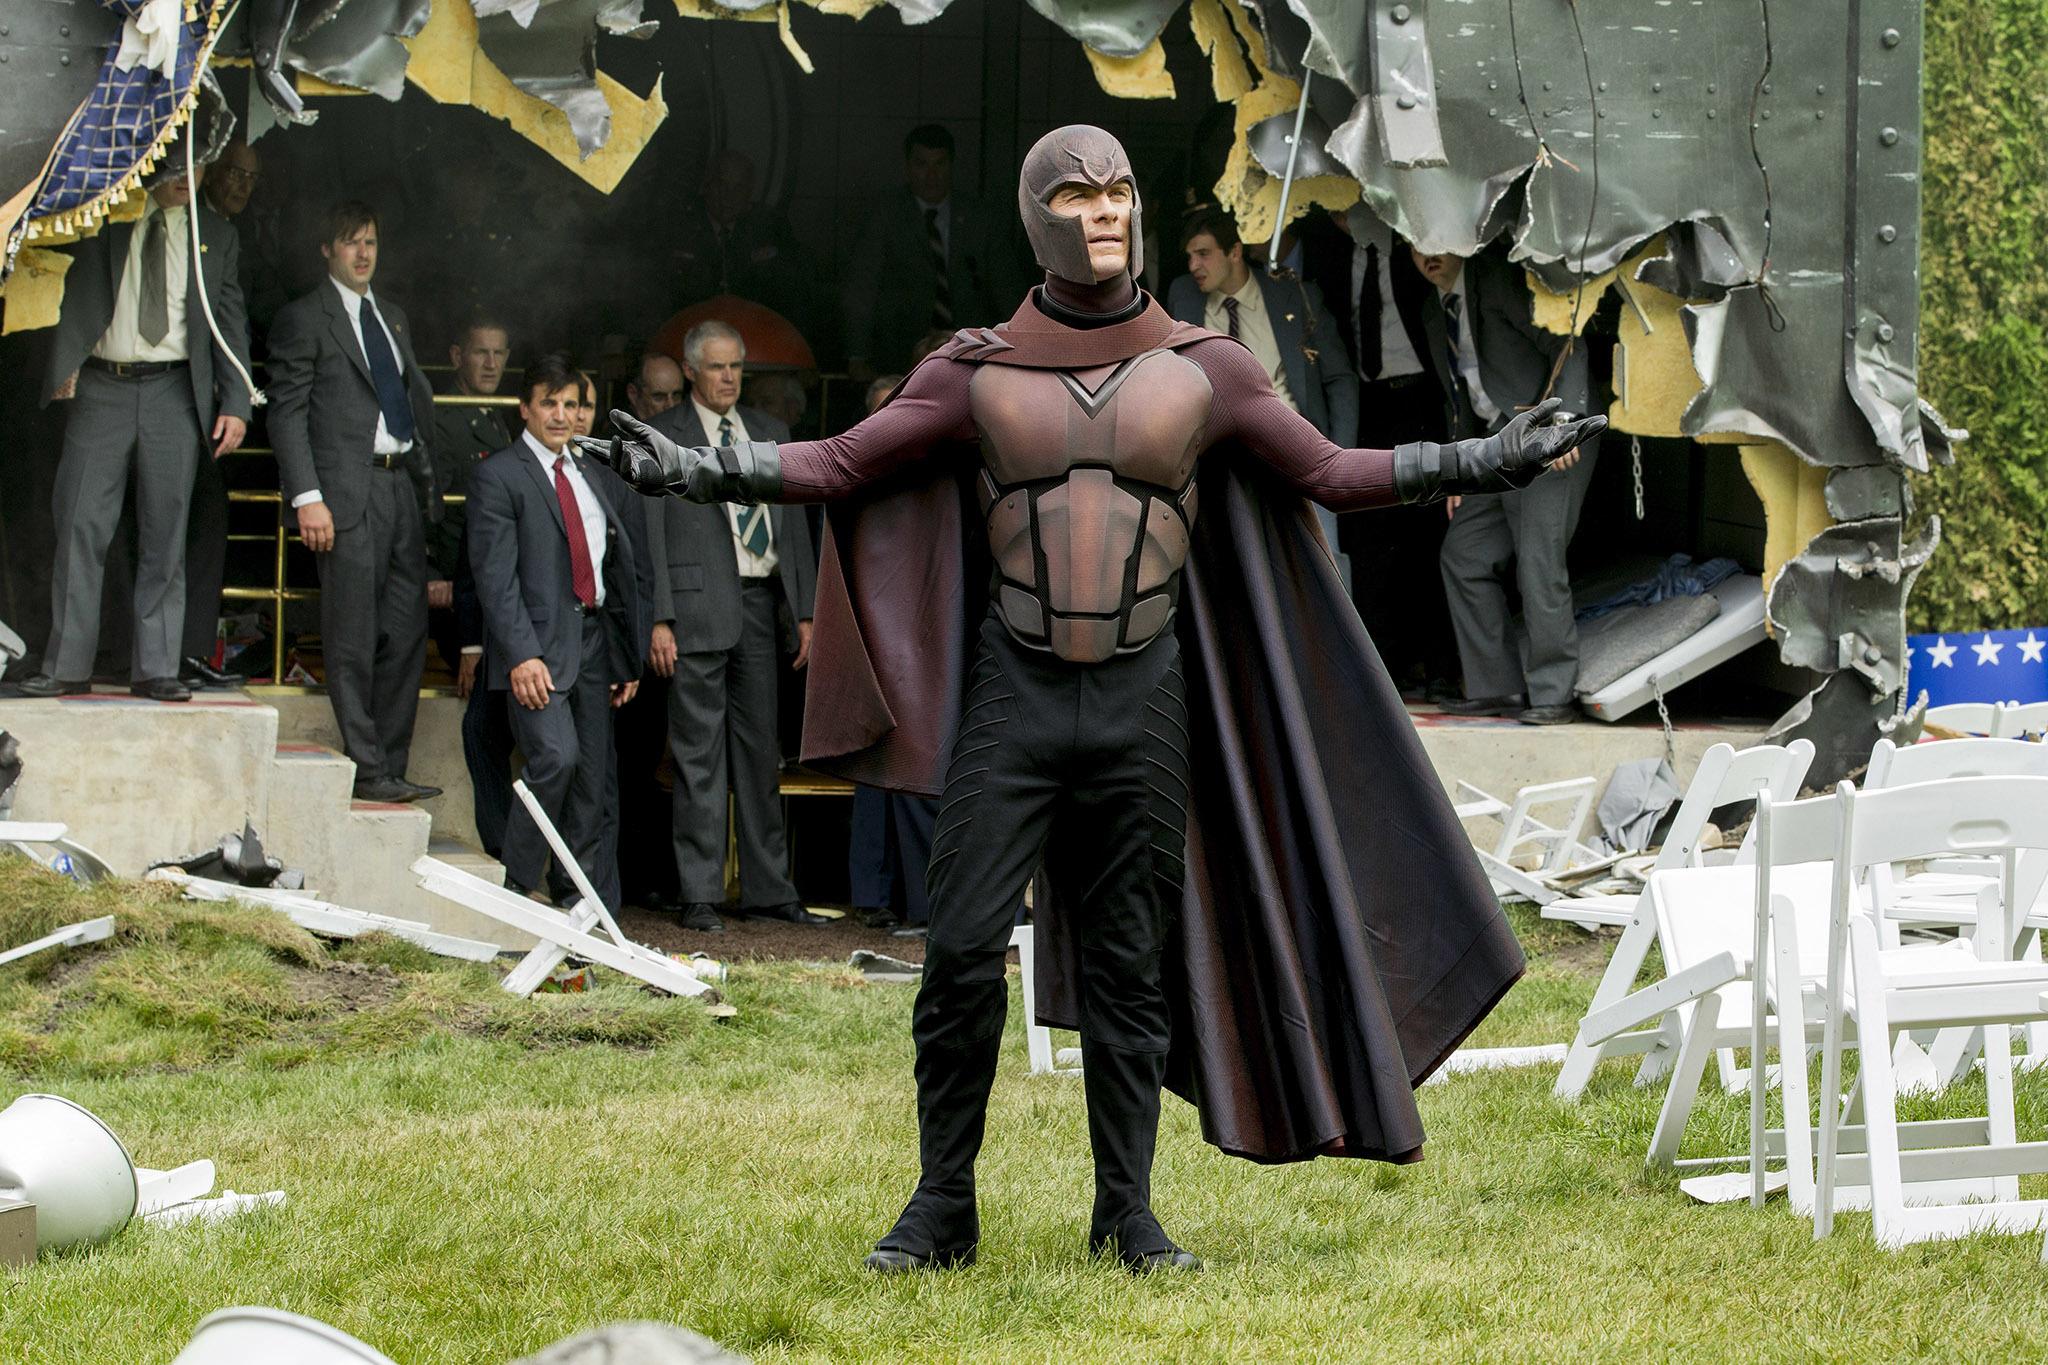 The X-Men (X-Men, X2: X-Men United, X-Men: First Class, X-Men: Days of Future Past, and X-Men: Apocalypse)